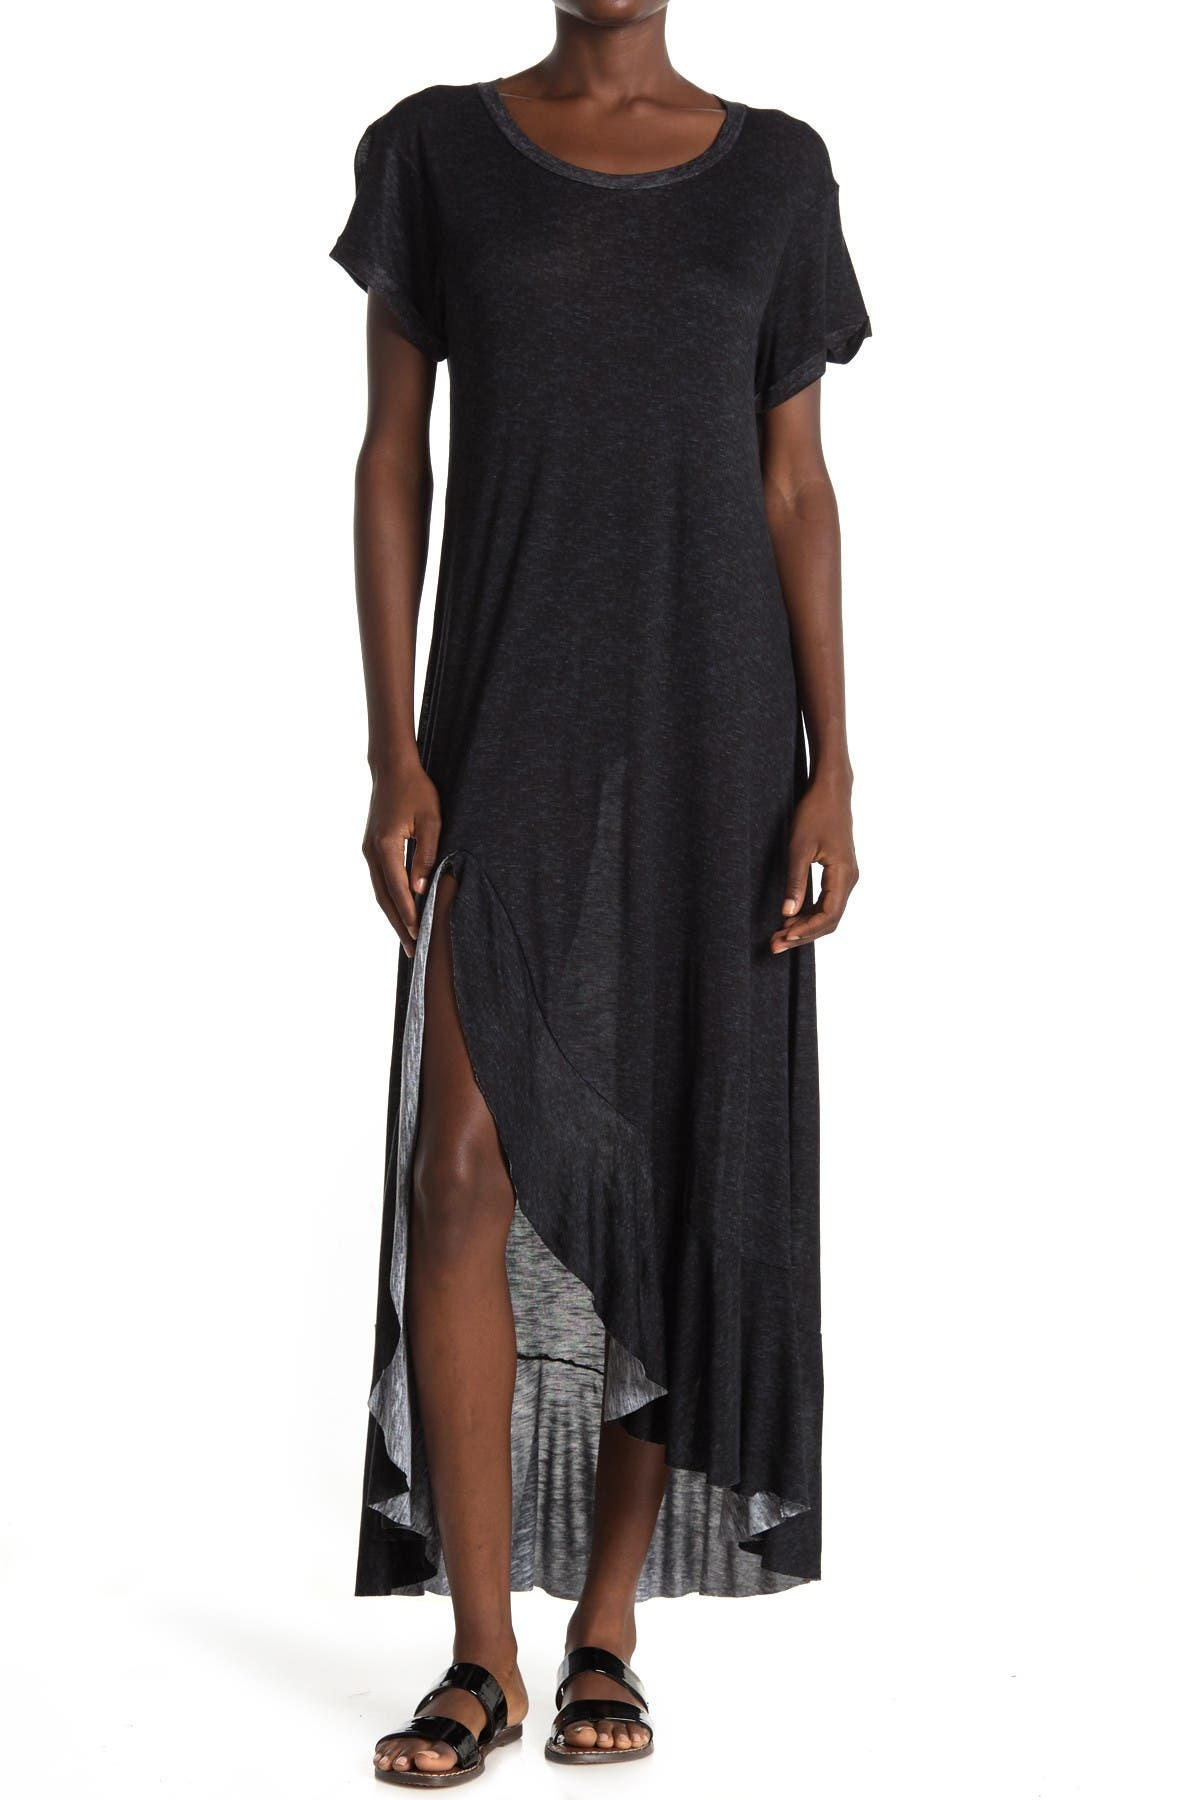 Image of WEST KEI Slub Knit Maxi T-Shirt Dress